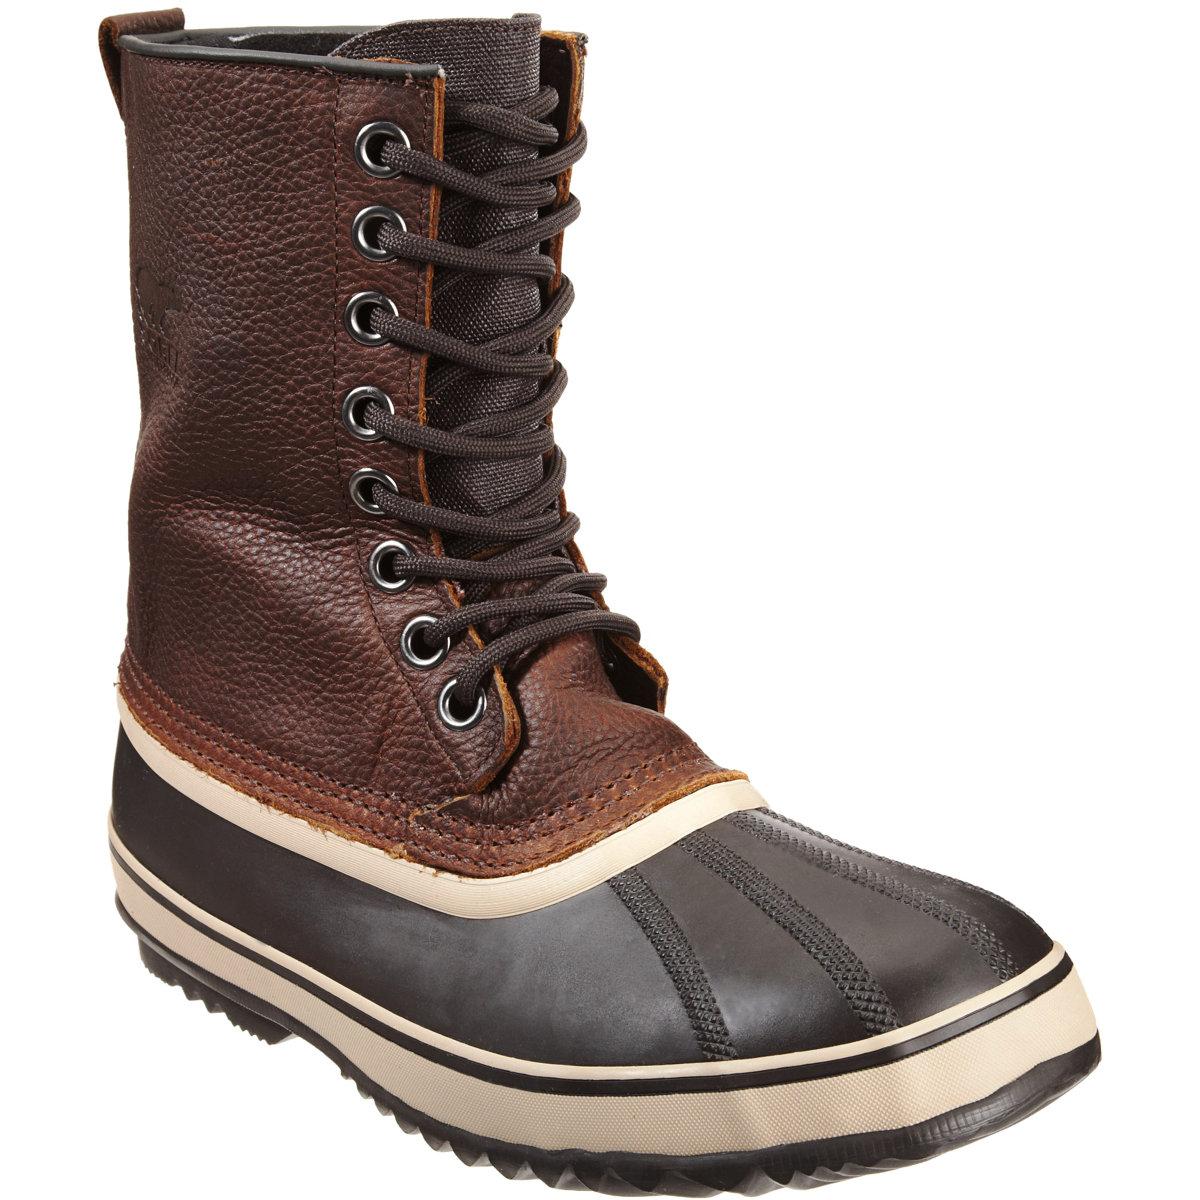 Sorel Joan Of Arctic Wedge Boots Black